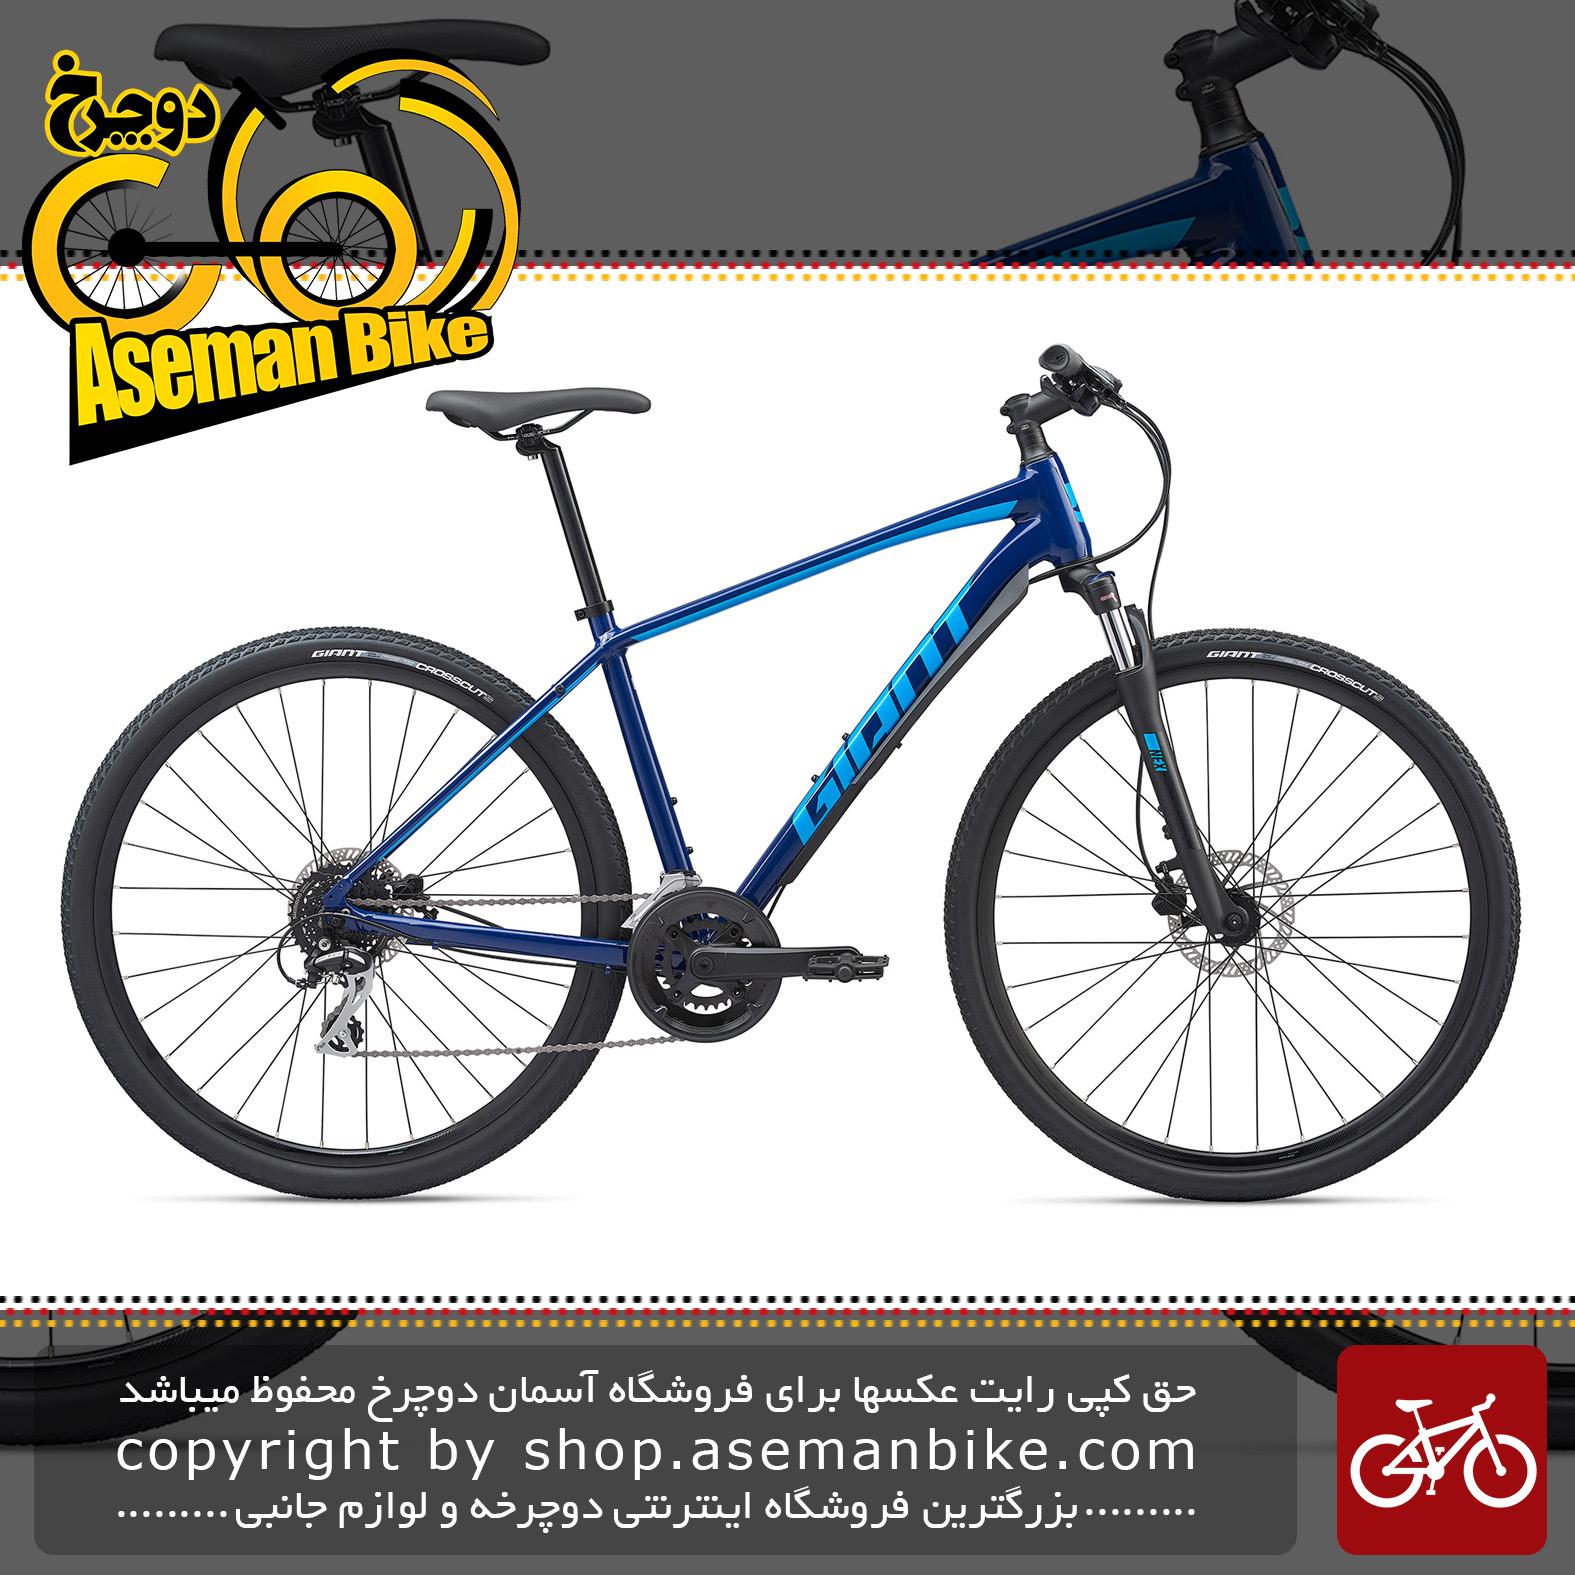 دوچرخه دومنظوره جاینت مدل روآم 3 دیسک هیدرولیک 2020 Giant Adventure Bicycle Roam 3 Disc 2020